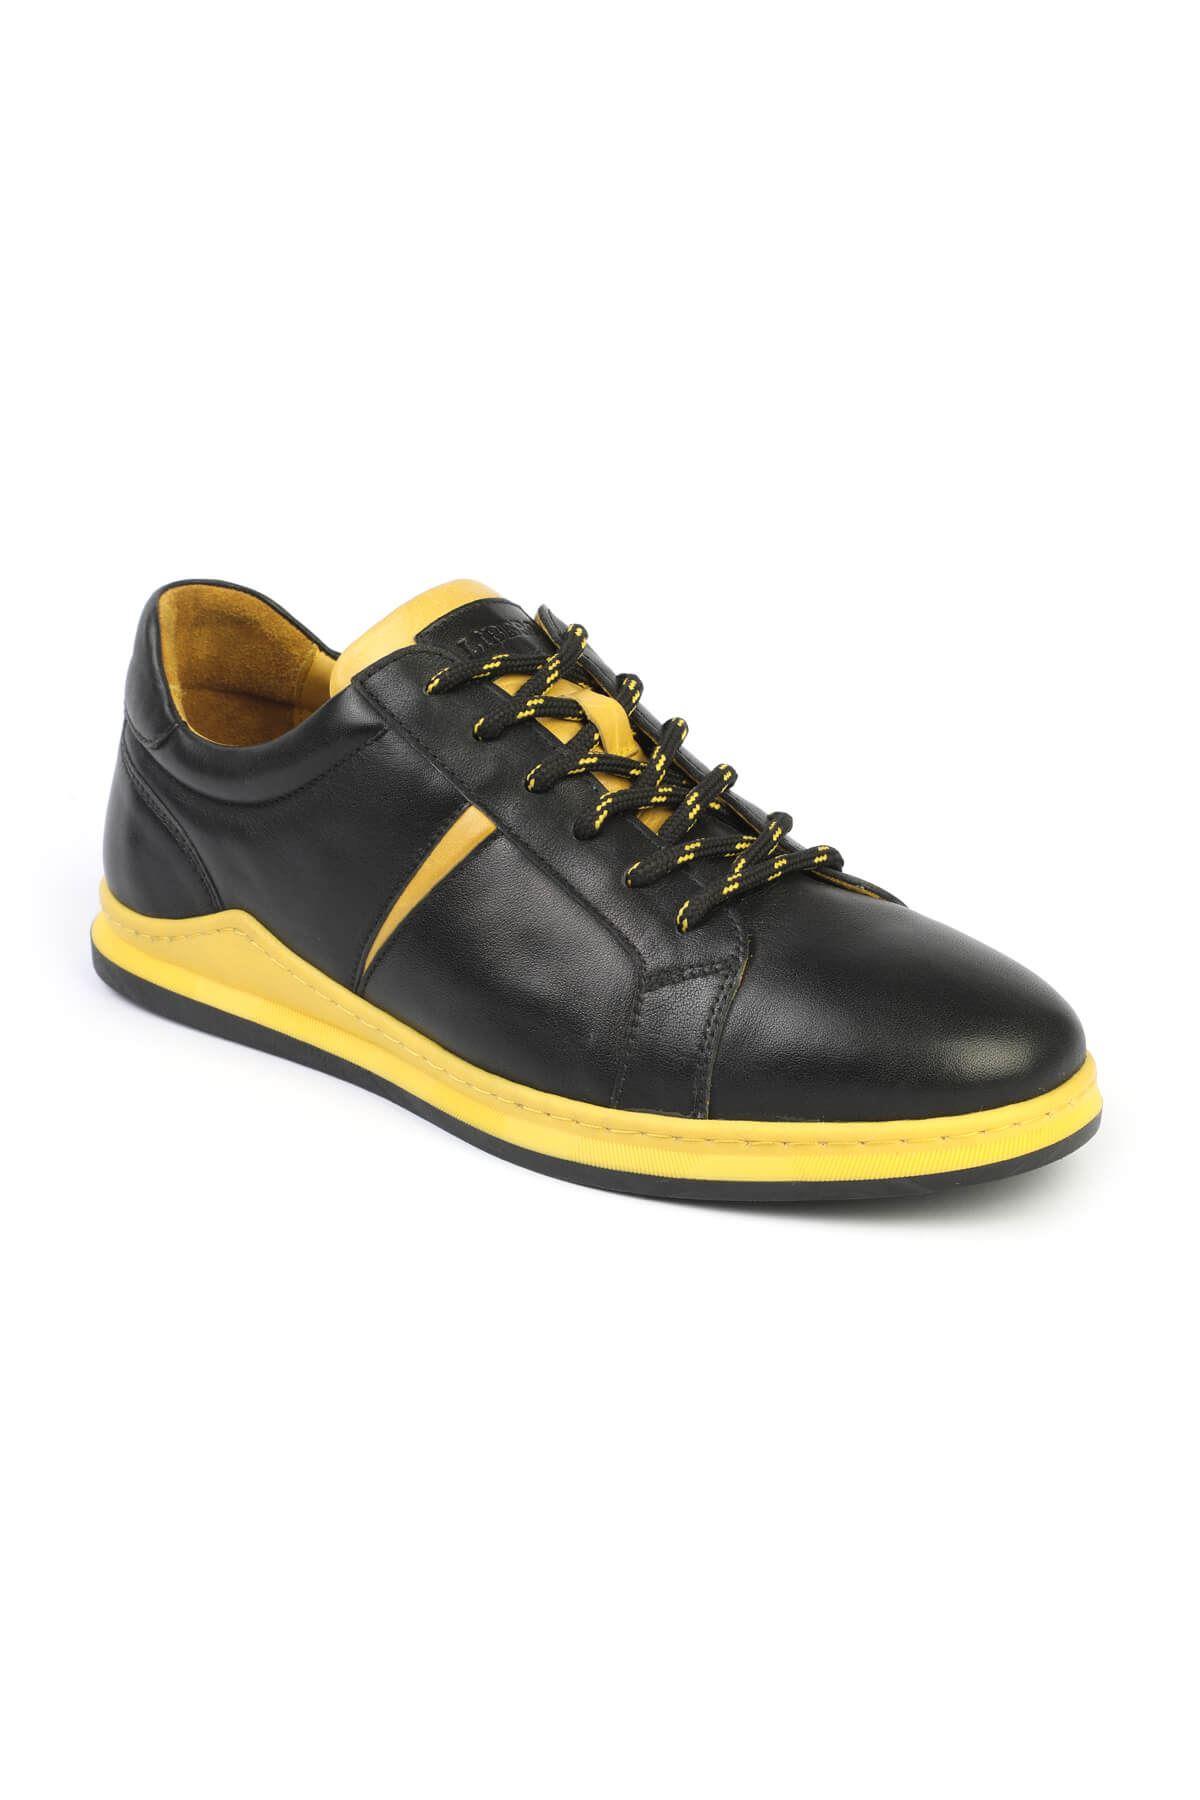 Libero 3196 Siyah Sarı Sneaker Ayakkabı